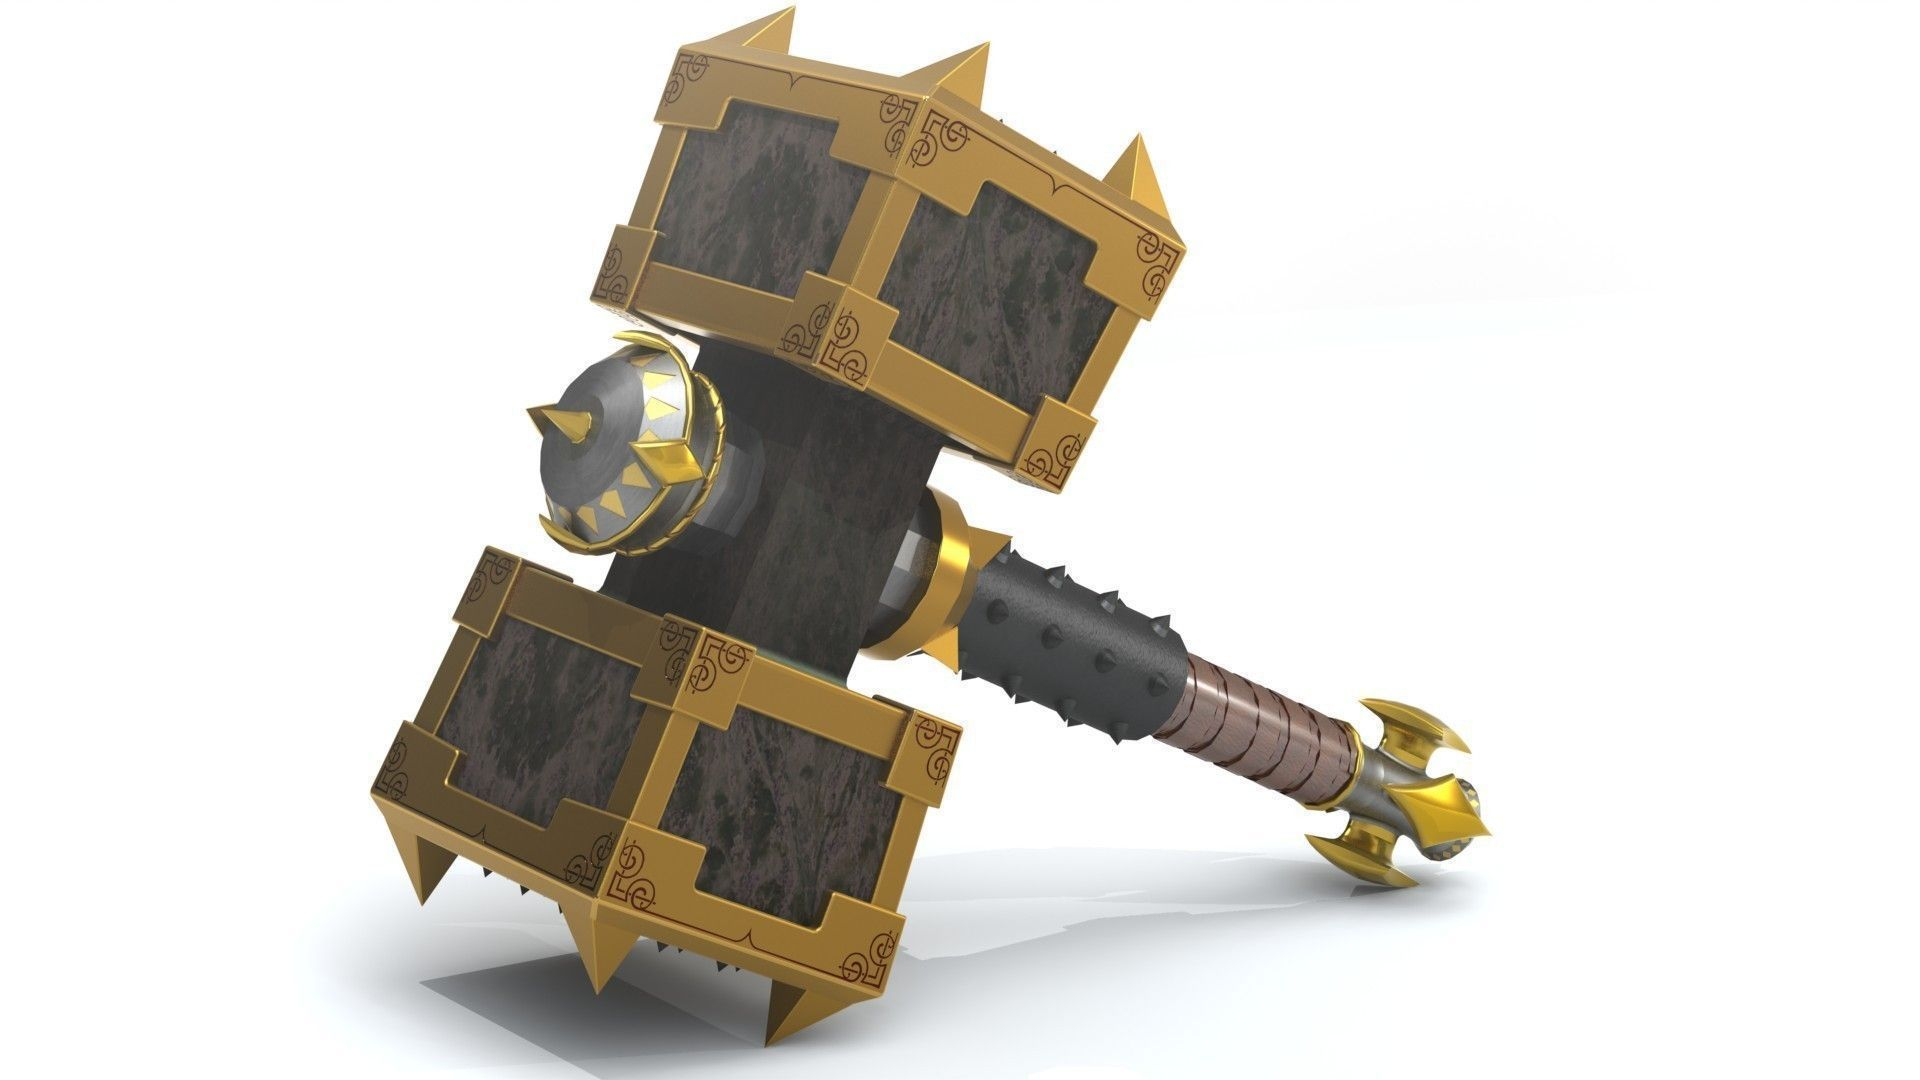 Battle Hammer 3d Model 3d Printable Stl Cgtrader Com